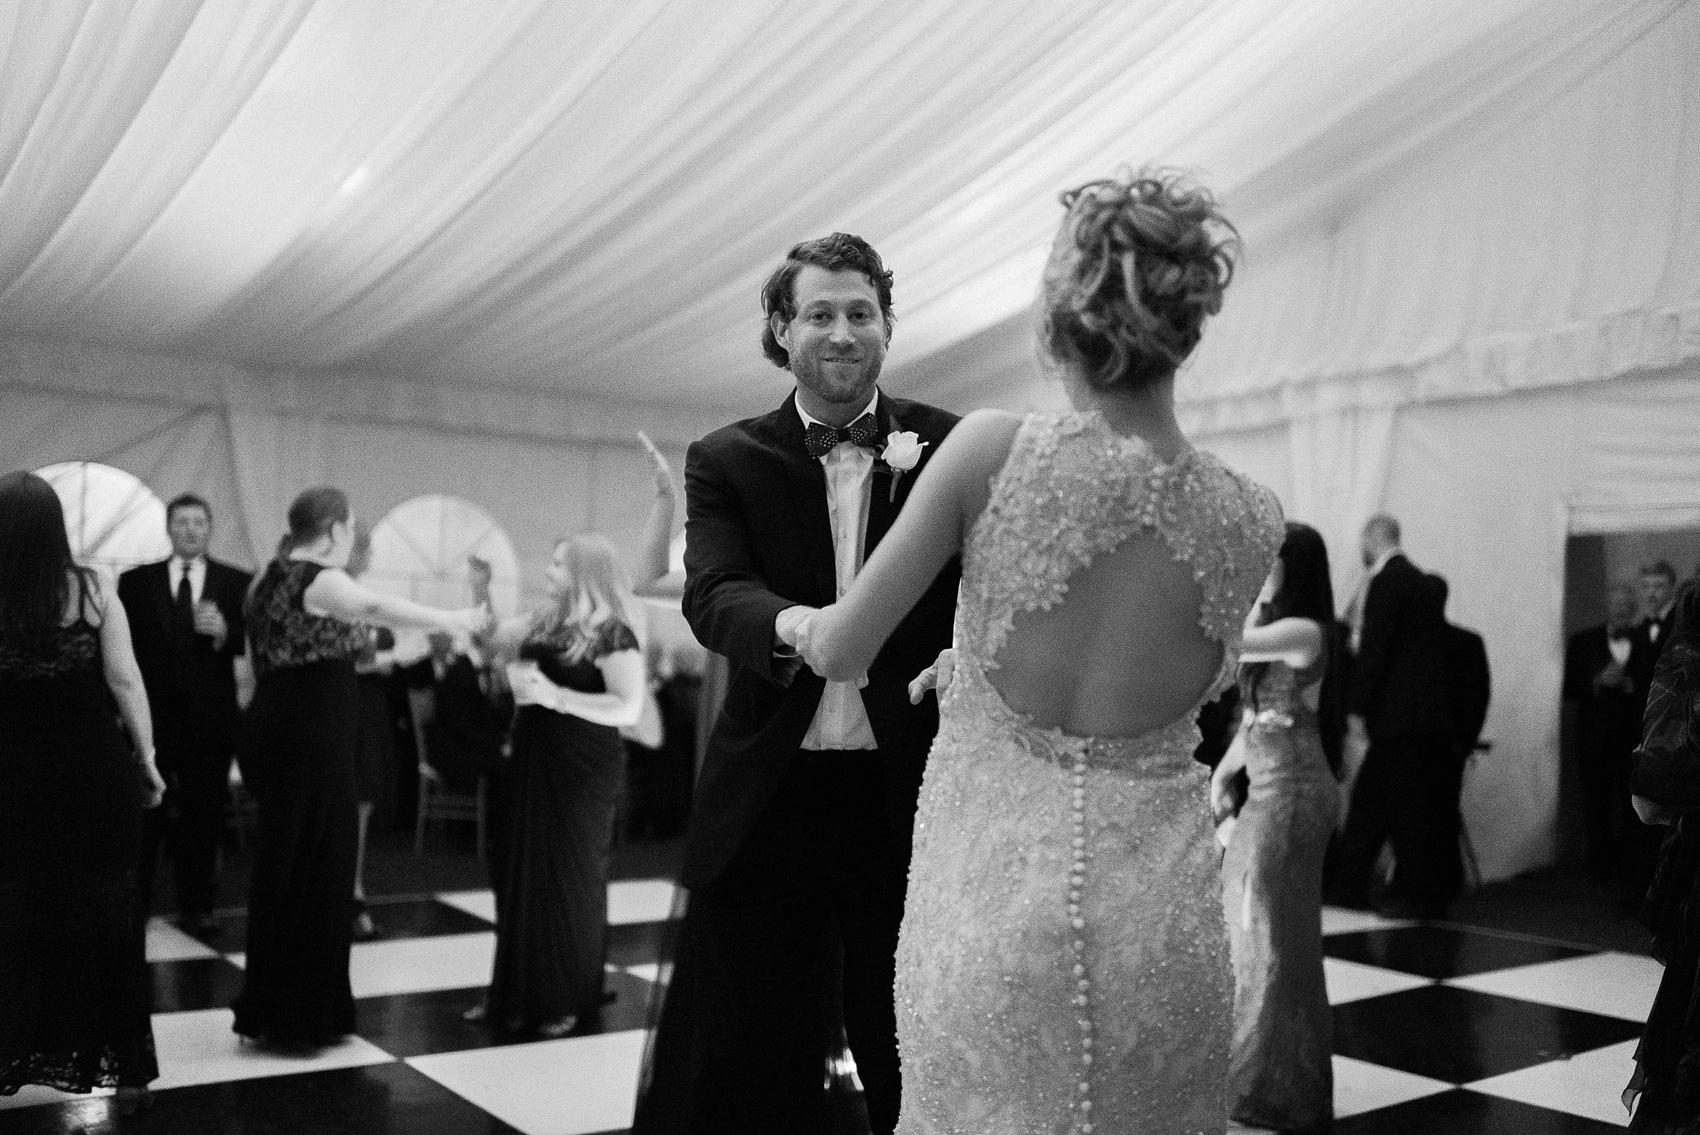 South_carolina_wedding_photographer_0118.jpg